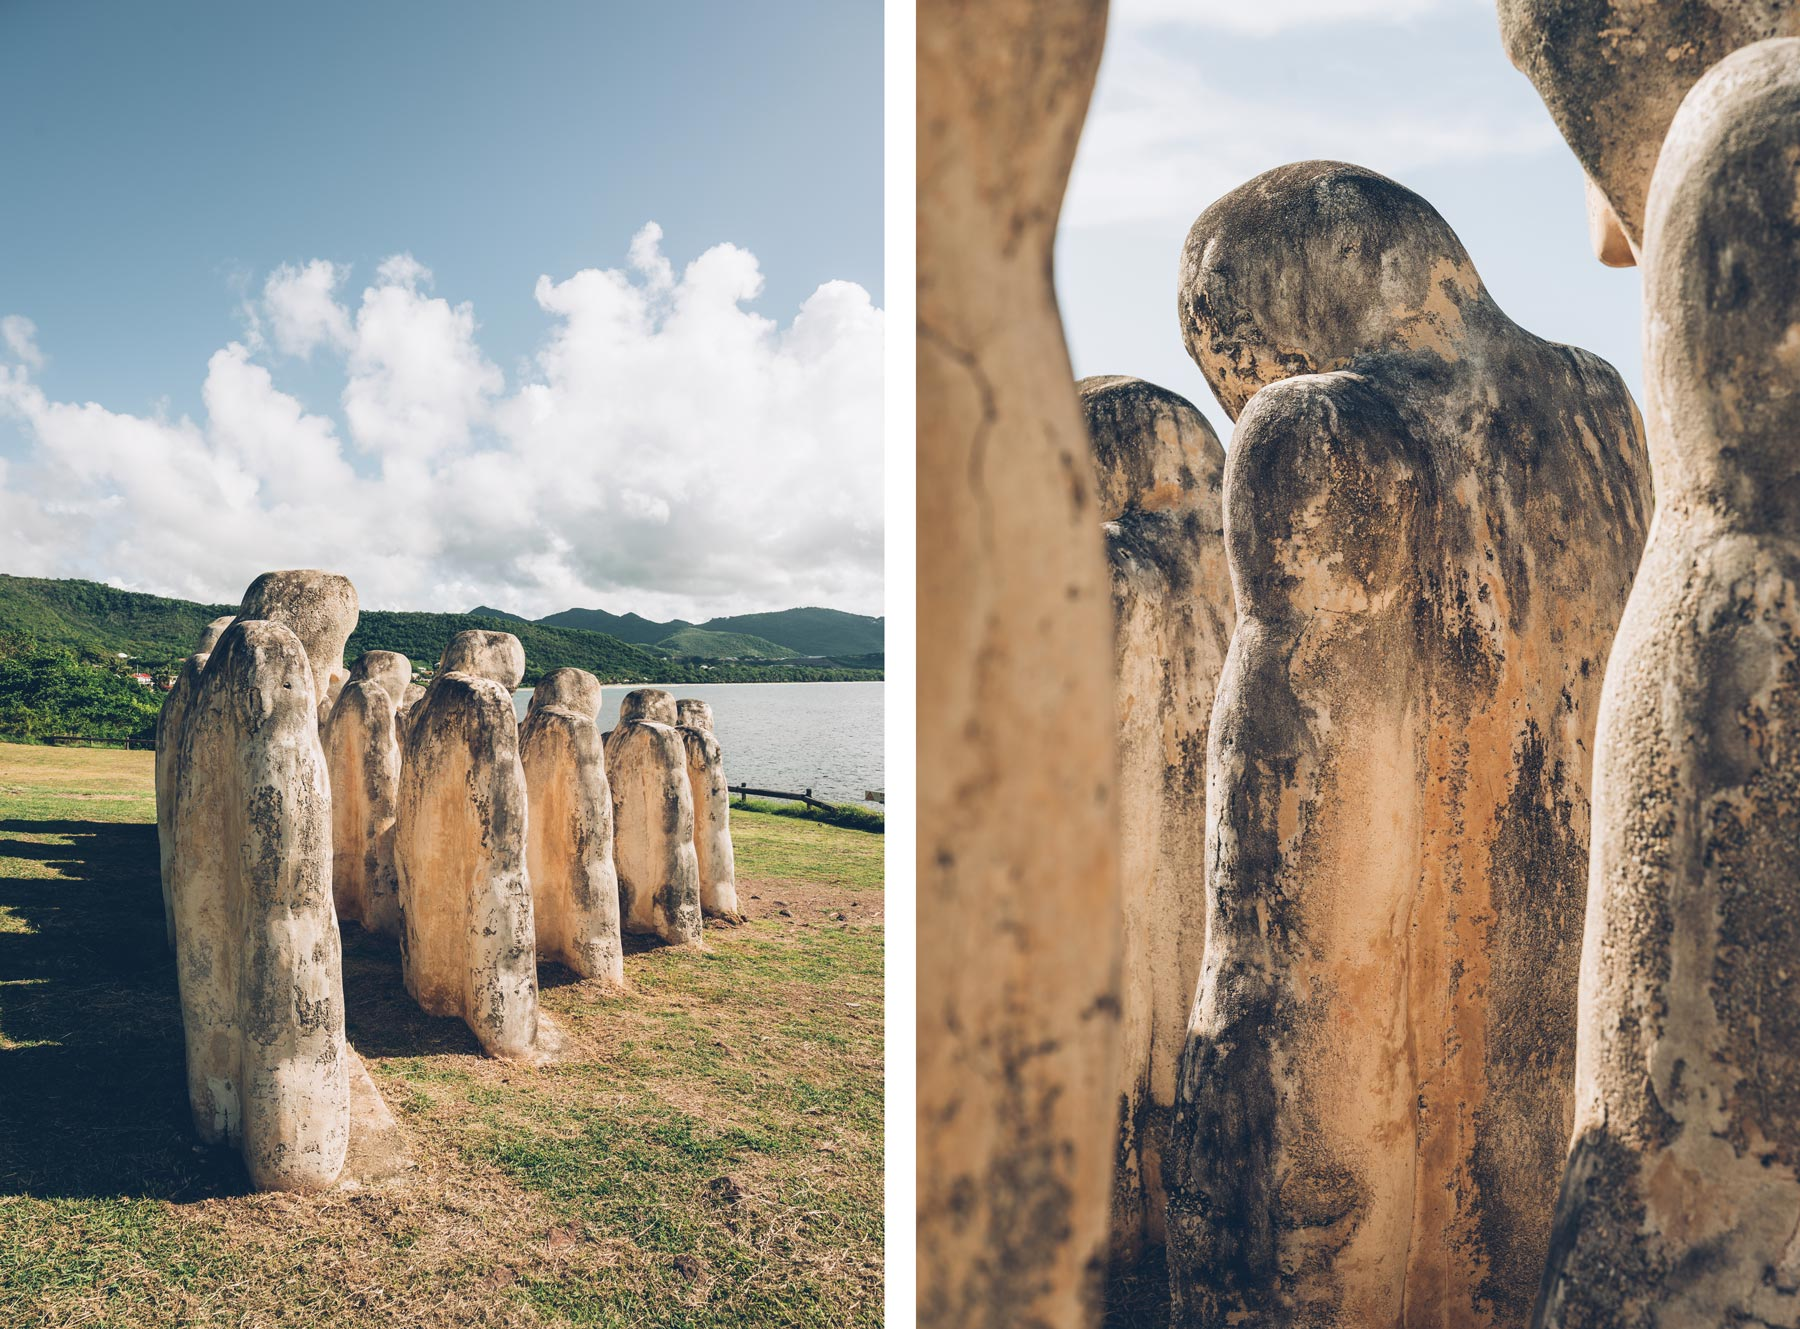 Mémorial du Cap 110, Martinique